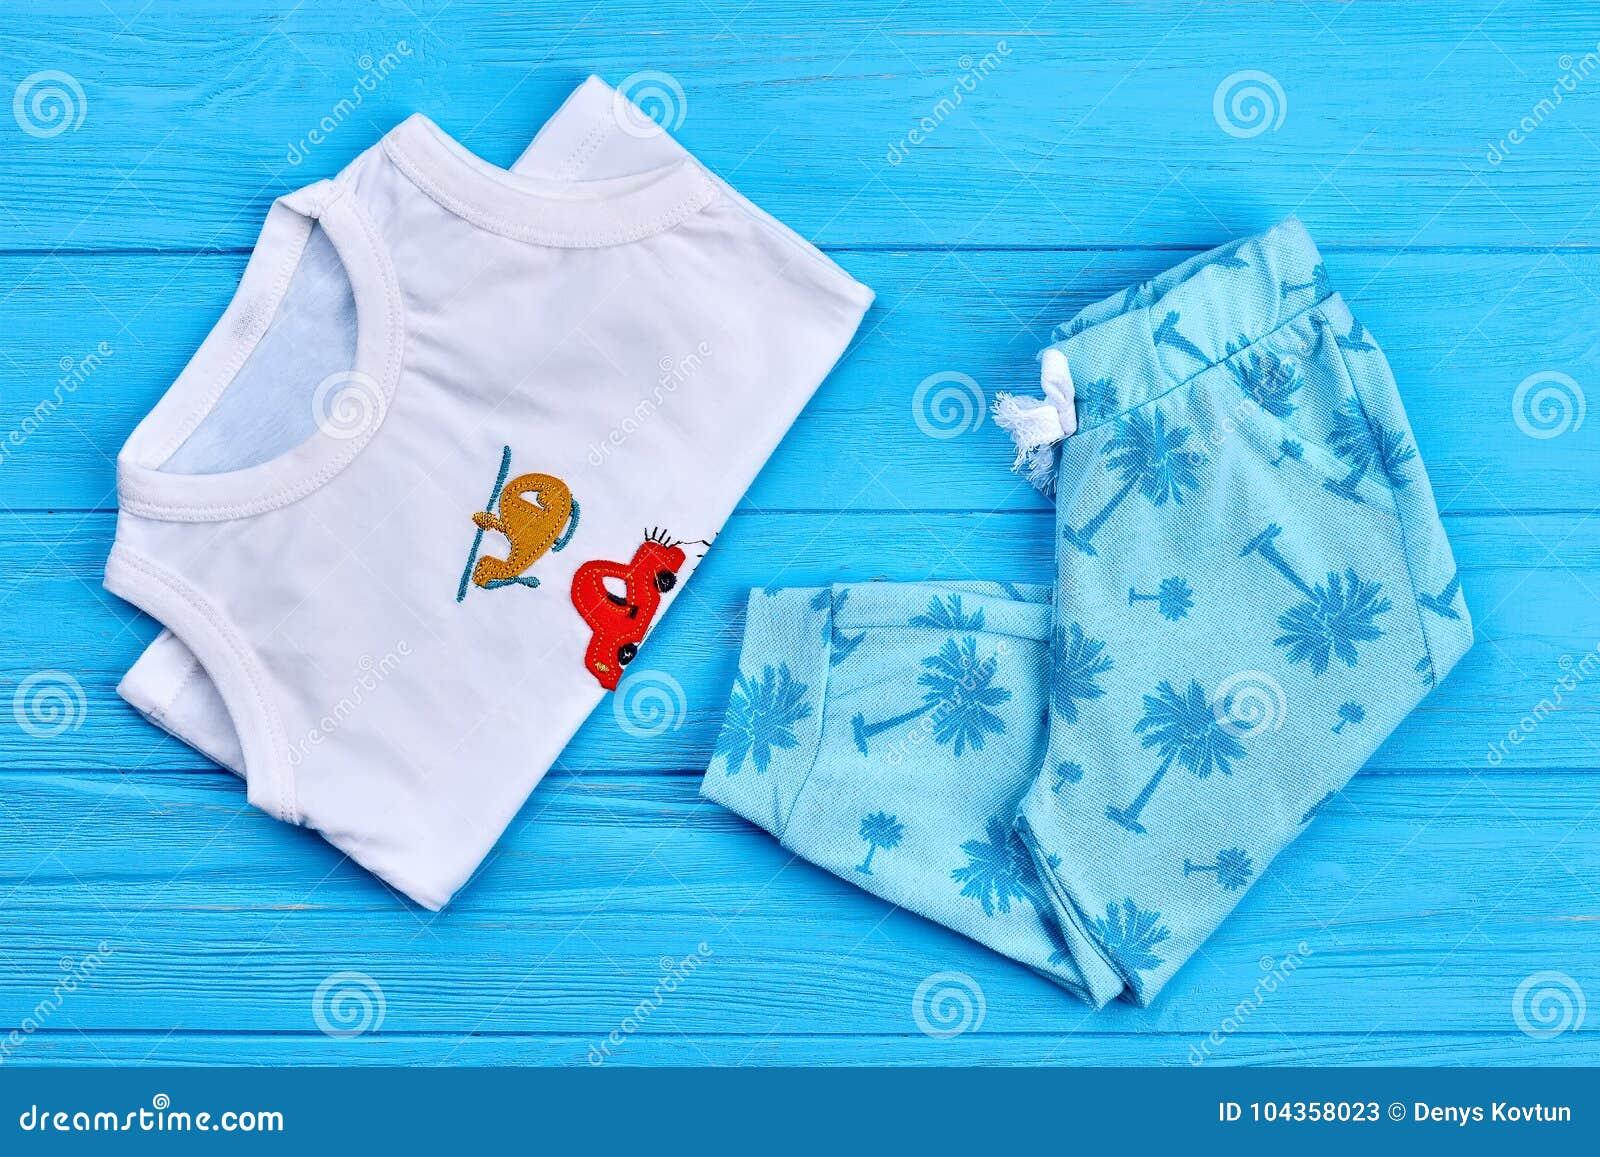 fcf76048a Set Of Patterned Kids Summer Wear. Stock Image - Image of pants ...